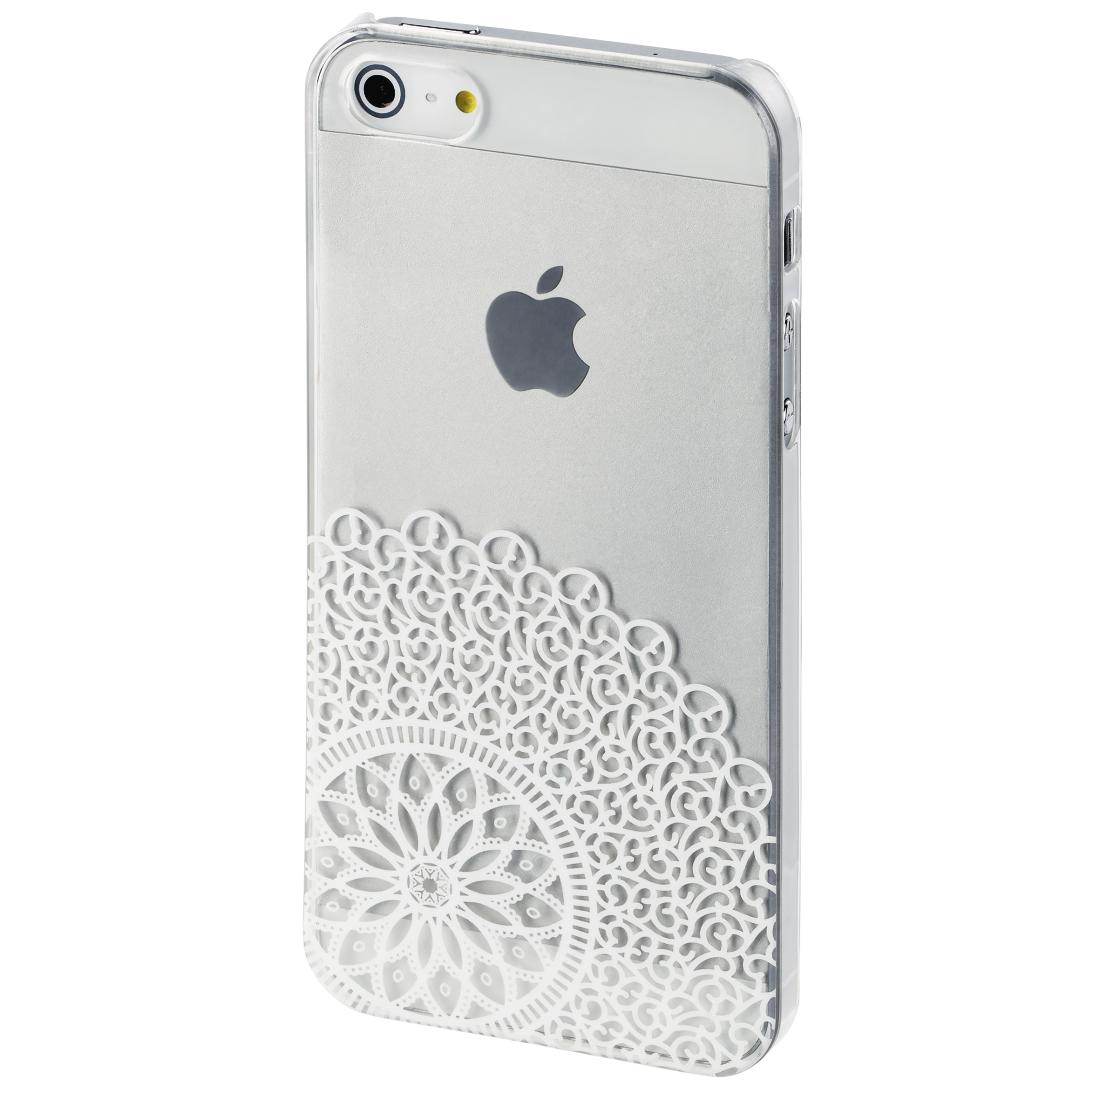 00137835 hama cover boho dance f r apple iphone 5 5s se transparent wei hama de. Black Bedroom Furniture Sets. Home Design Ideas